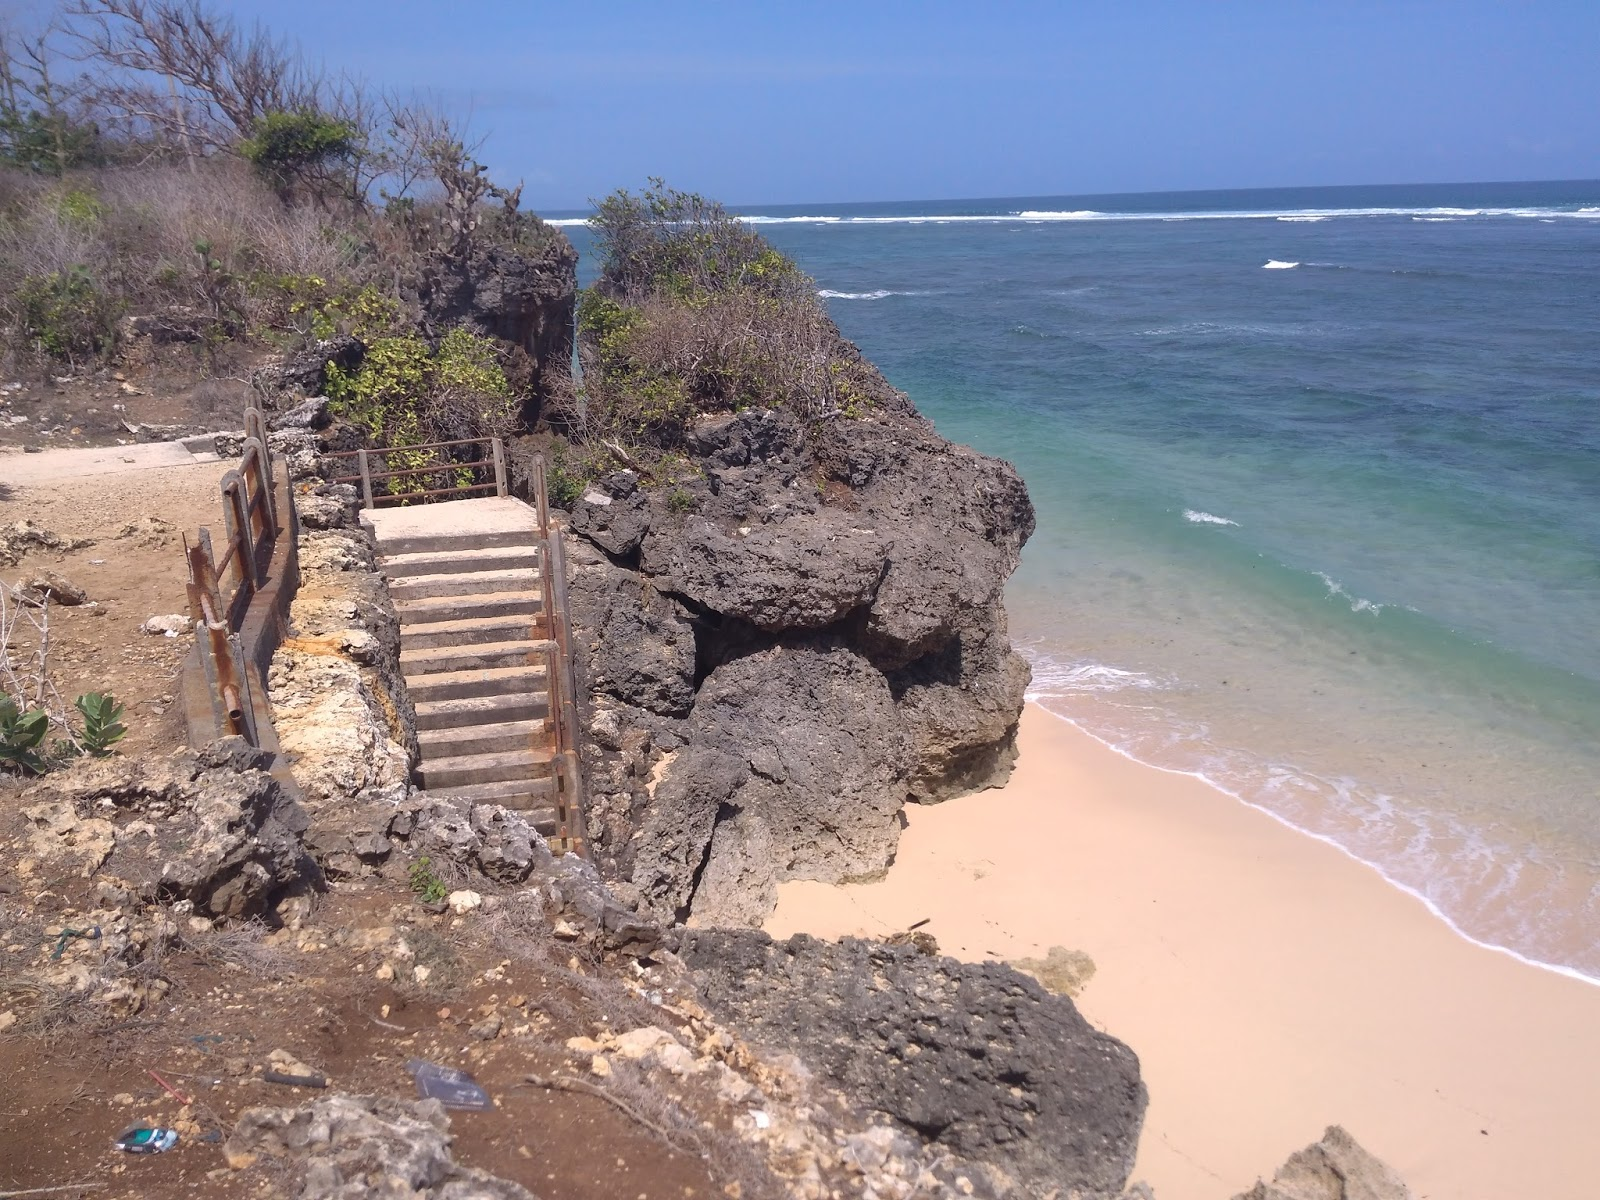 Wisata Pantai Pura Geger Bali Pantai Tersembunyi Di Kuta Selatan